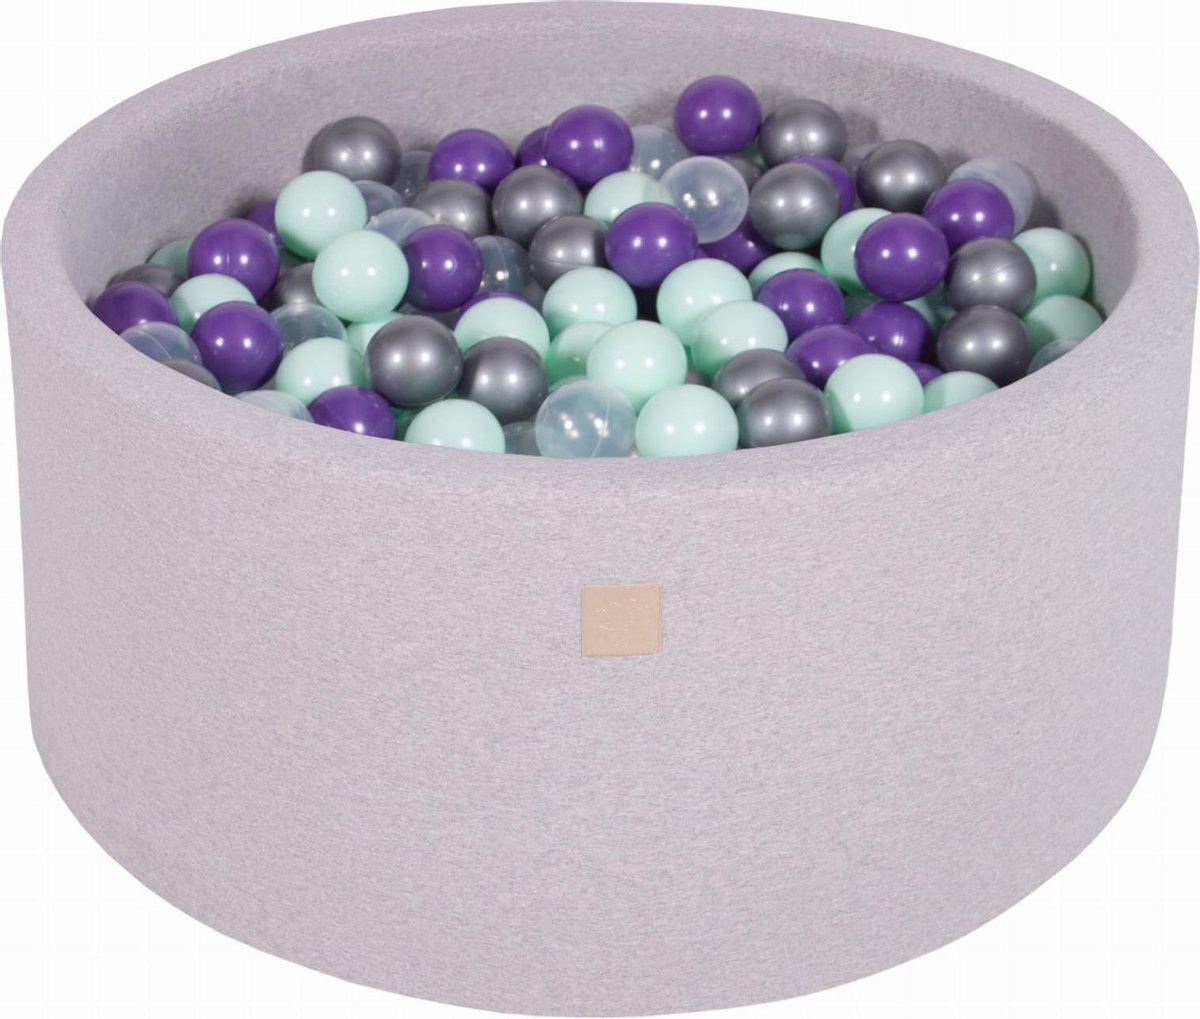 Ronde Ballenbak set incl 300 ballen 90x40cm - Licht Grijs: Mint, Transparant, Zilver, Violet